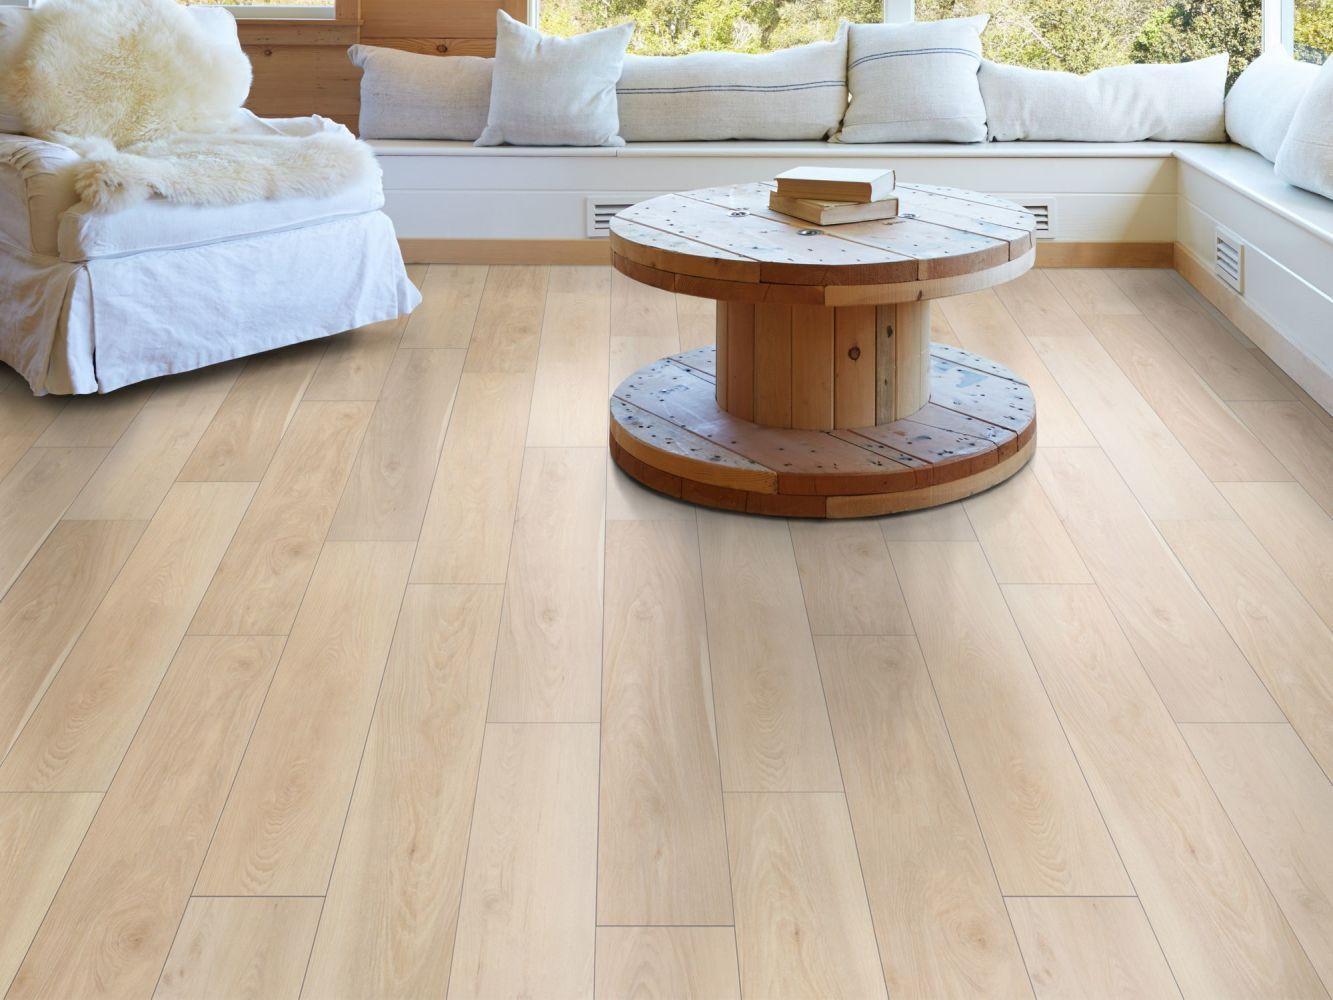 Shaw Floors Resilient Residential Pantheon Hd+ Natural Bevel Alabaster 01098_1051V